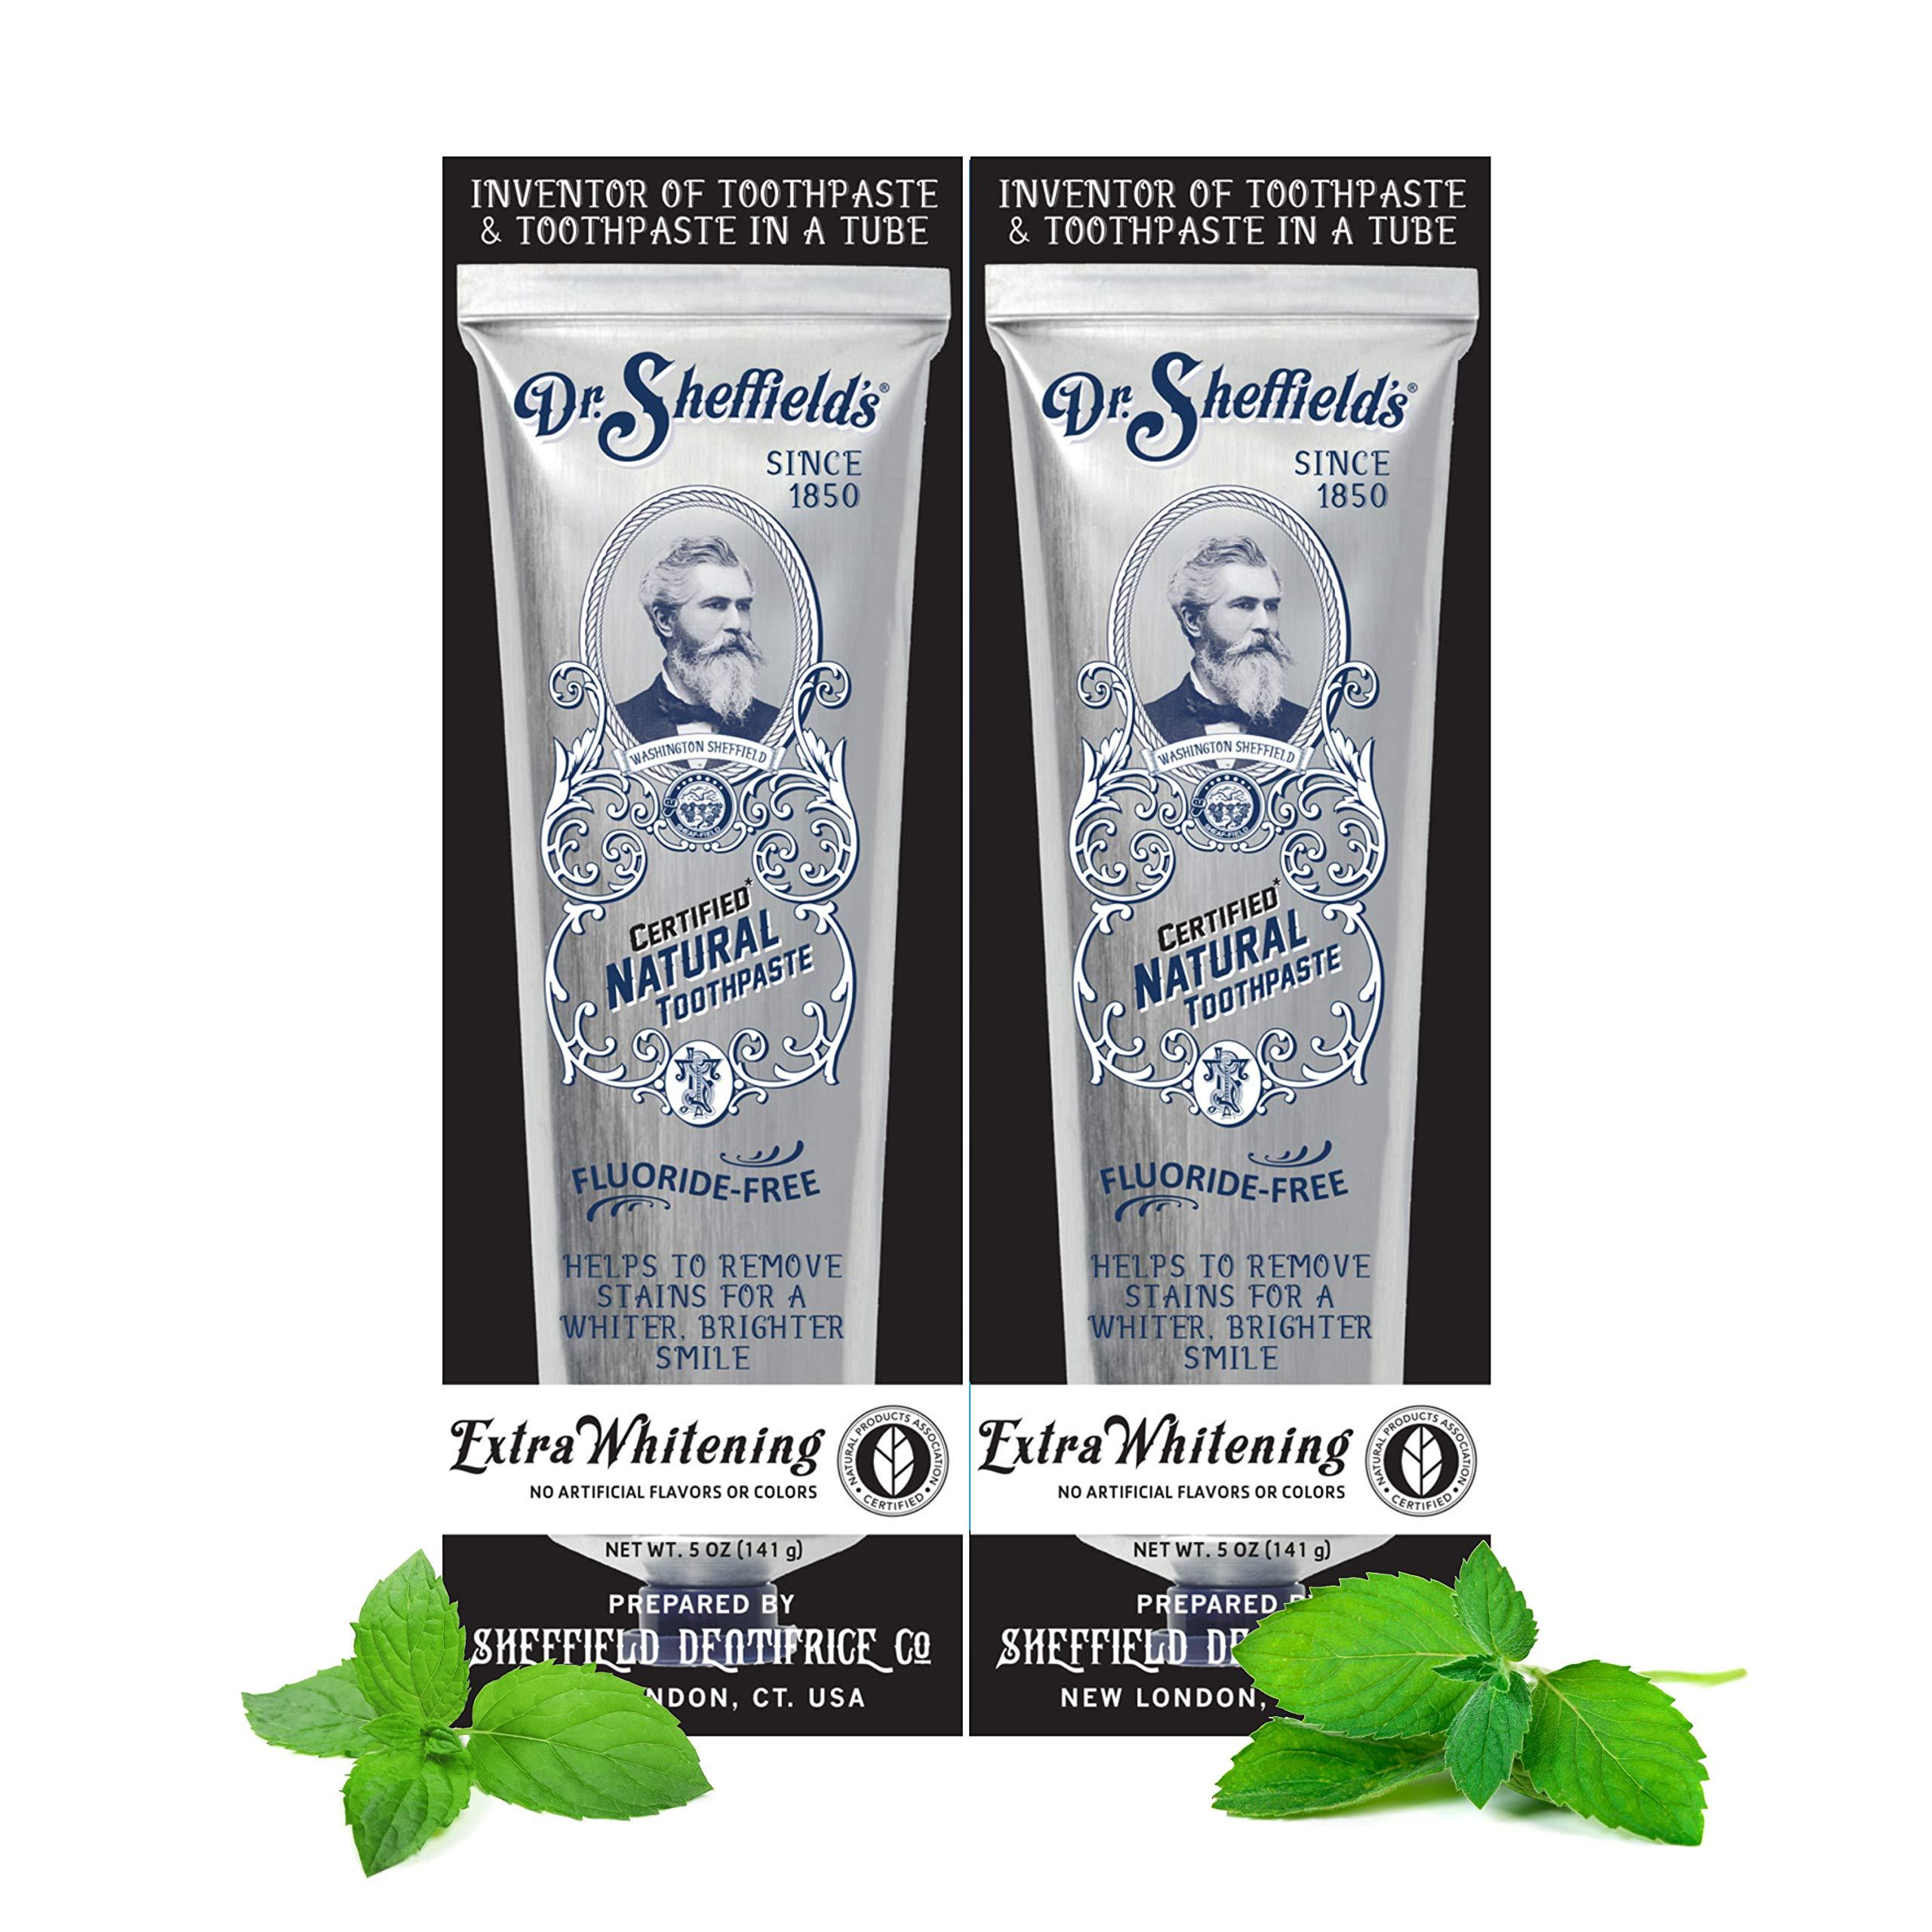 Dr. Sheffield's Premium Natural Extra Whitening Toothpaste, 5 OZ (Extra Whitening)